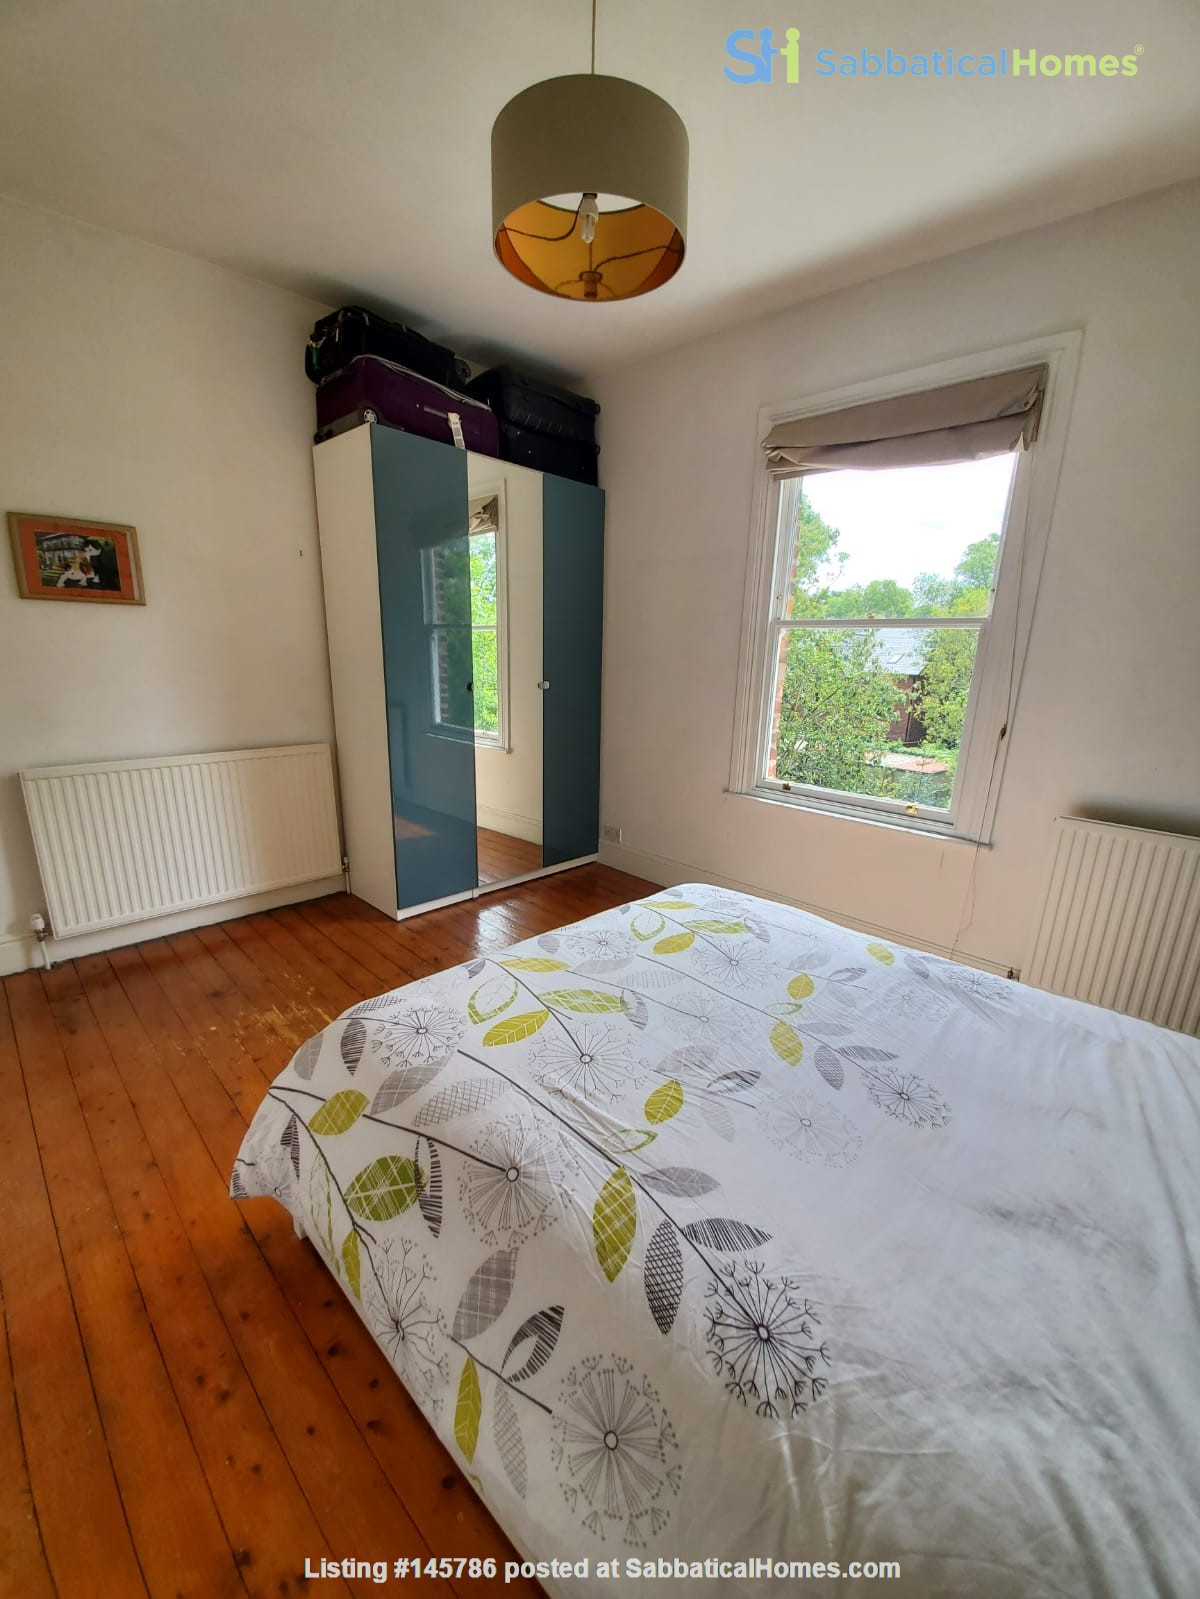 Manchester UK: Spacious, Quiet, Sunlight Filled Flat in Great Neighbourhood Home Rental in  3